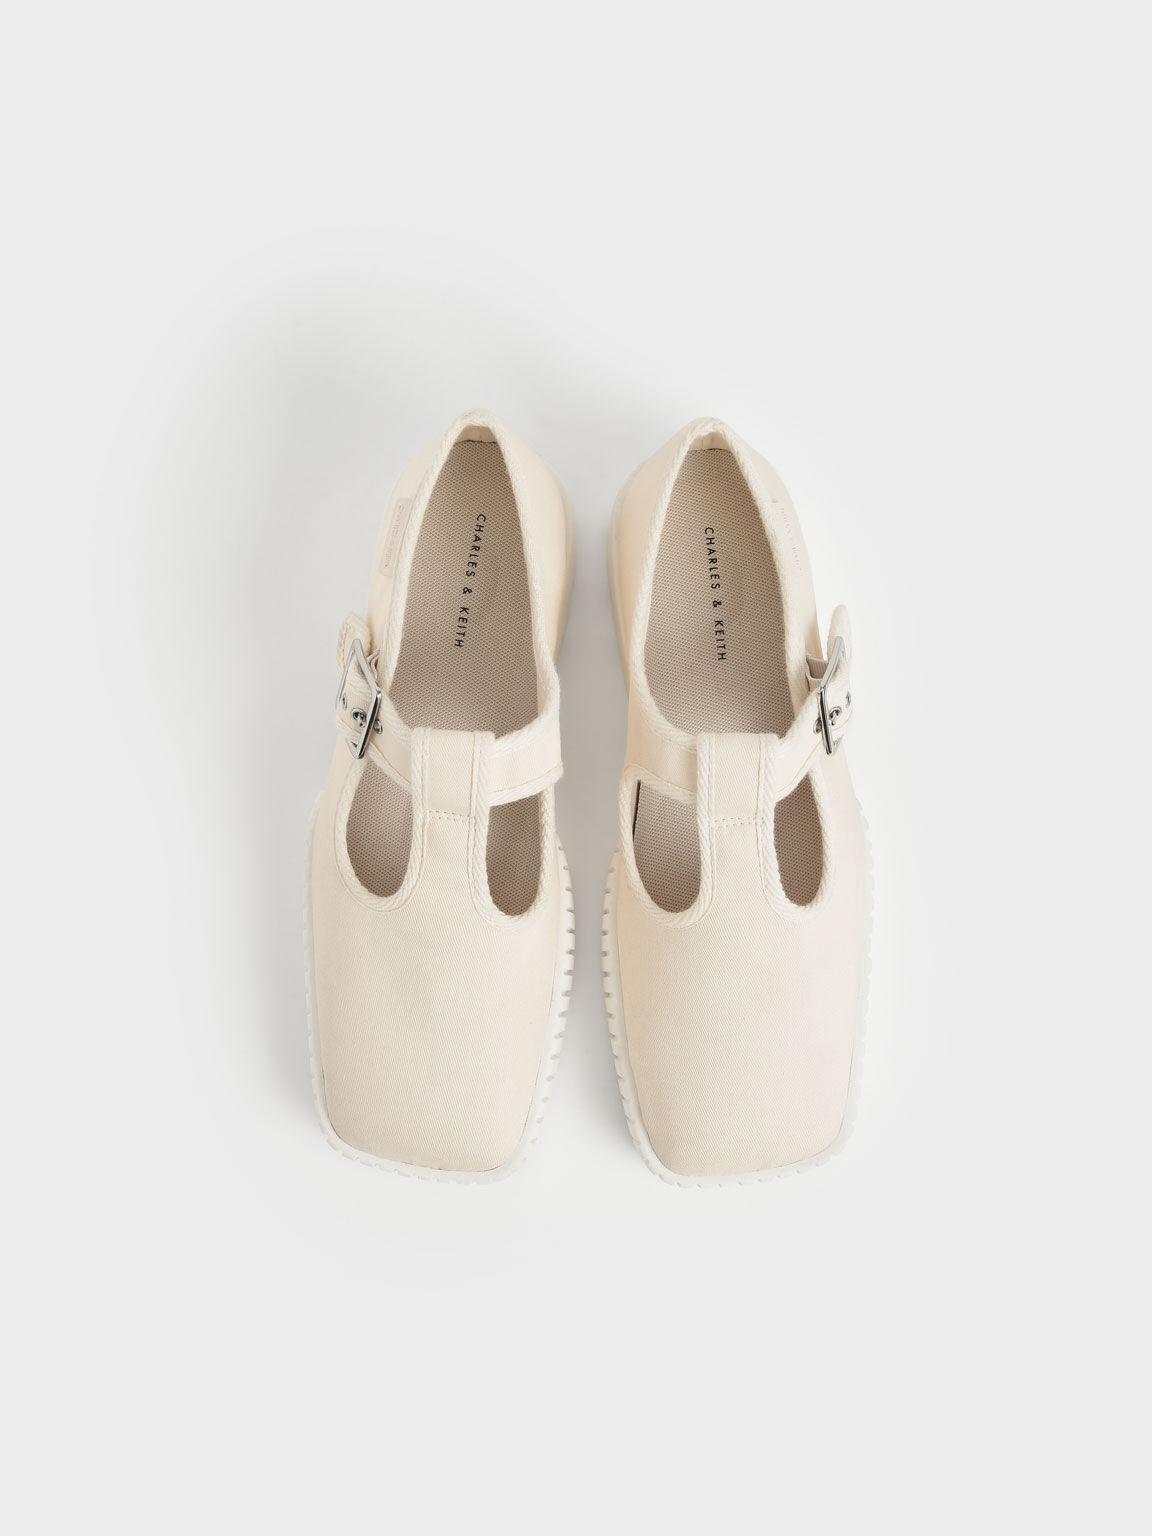 Cotton Buckled Sneakers, Cream, hi-res